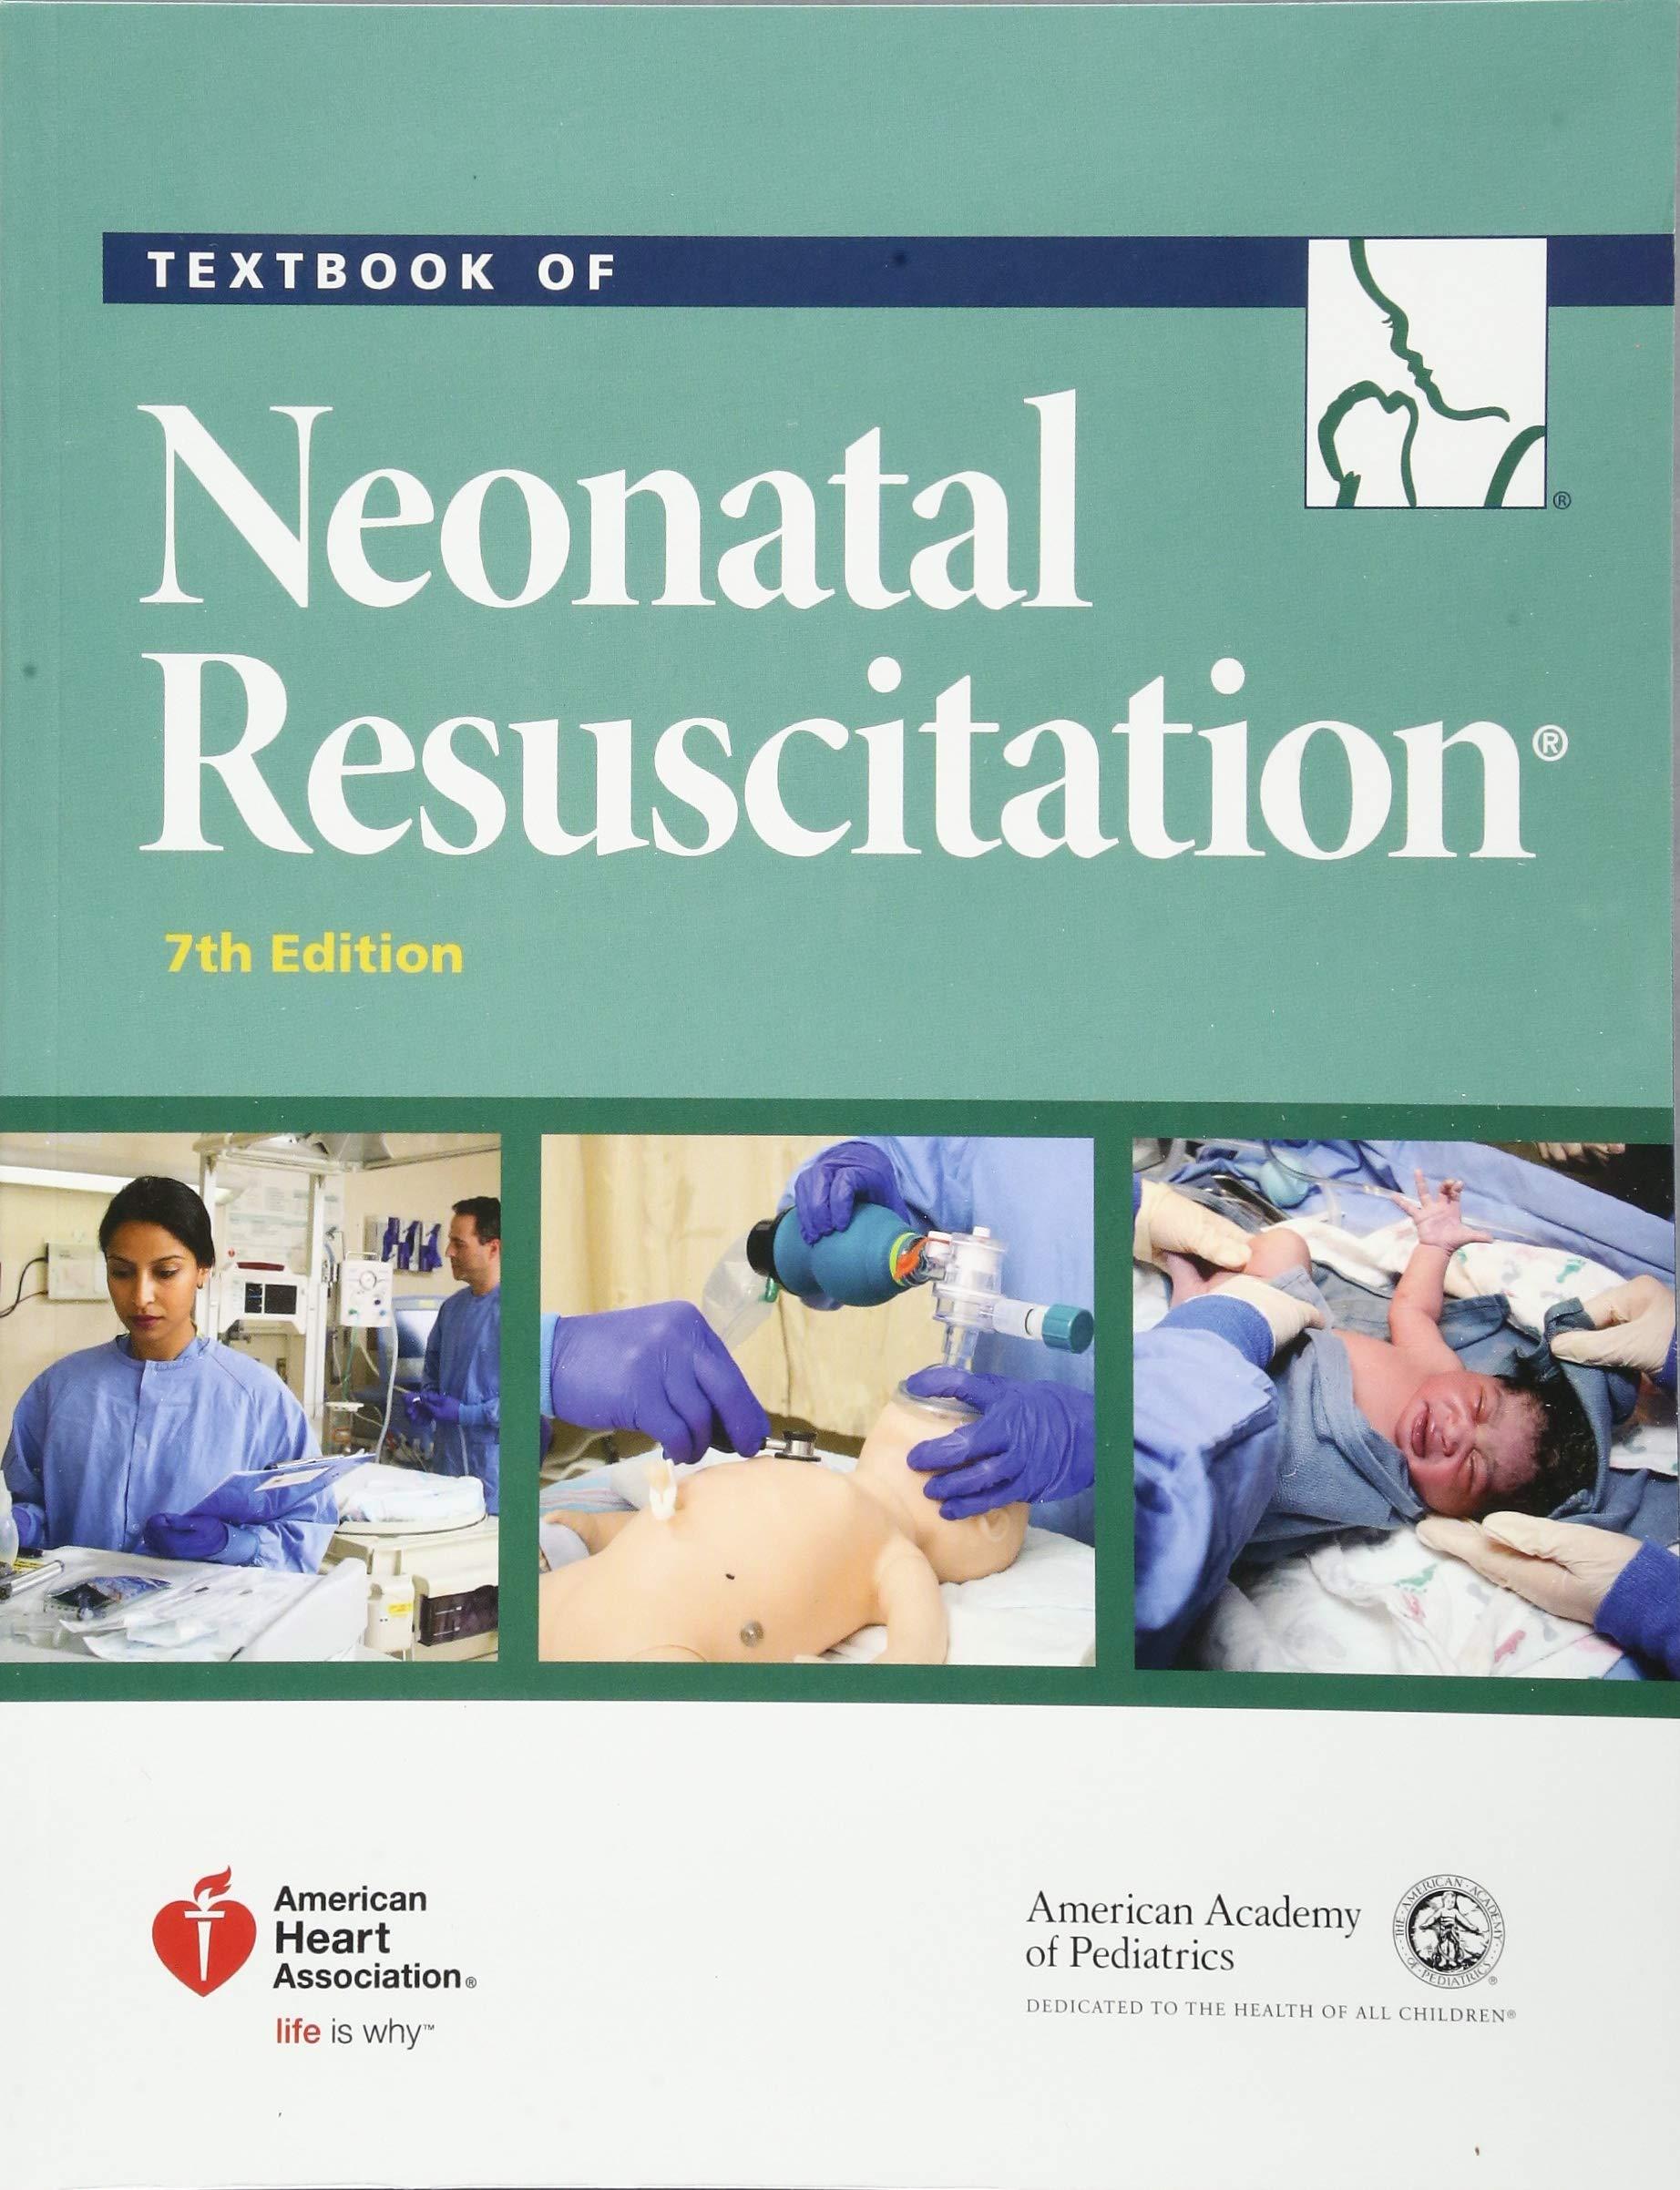 Textbook of Neonatal Resuscitation (NRP) by American Academy of Pediatrics